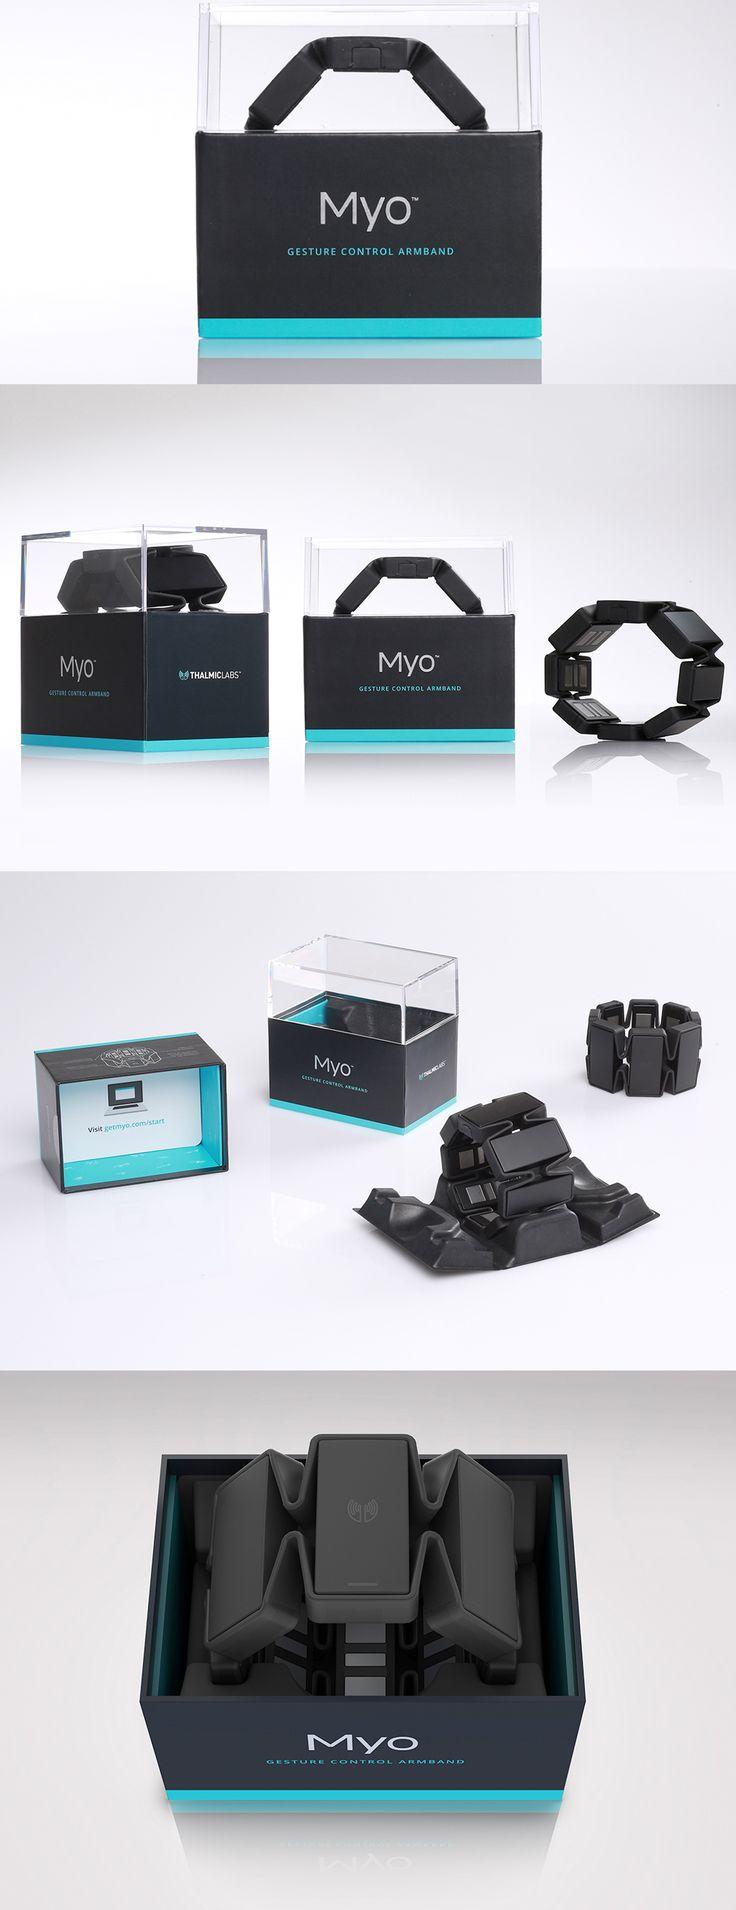 Myo Gesture Control Armband Packaging Design